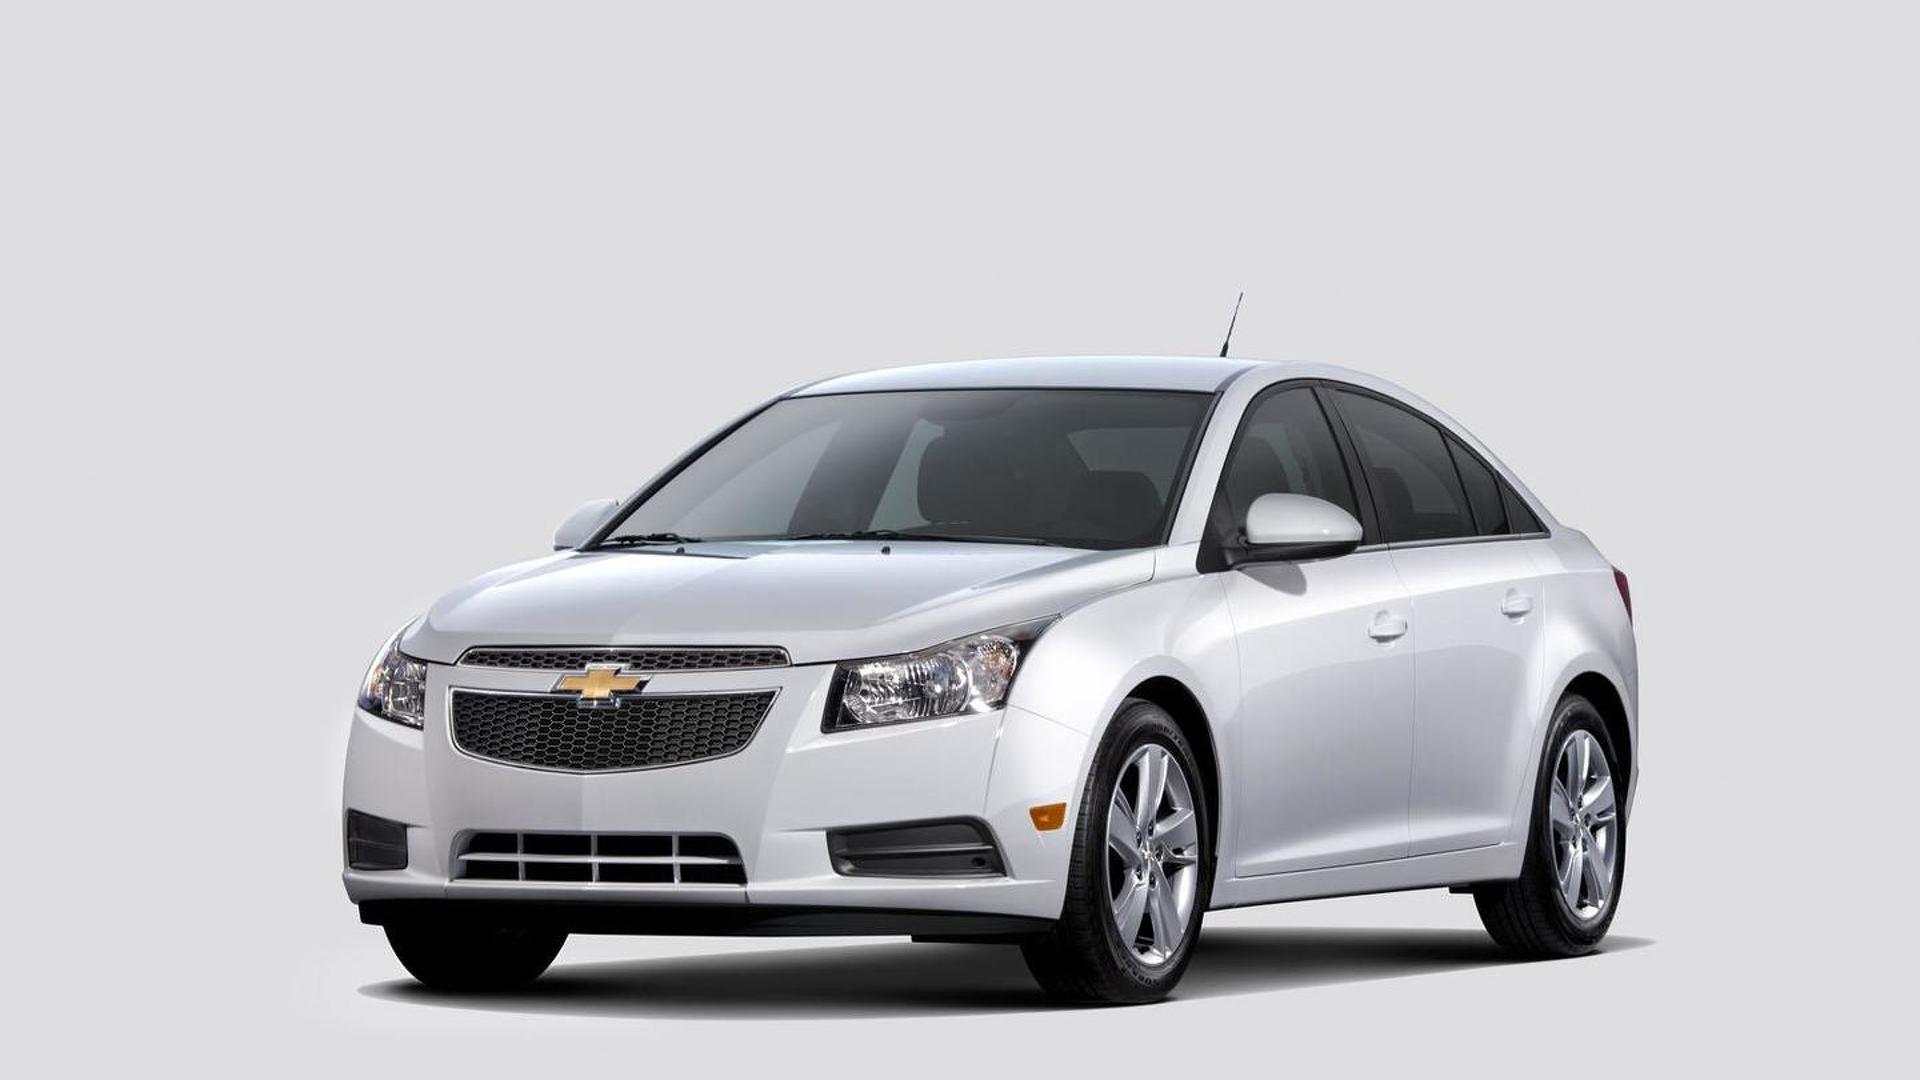 Chevrolet Cruze Diesel >> 2014 Chevrolet Cruze Diesel Rated At 46 Mpg Highway